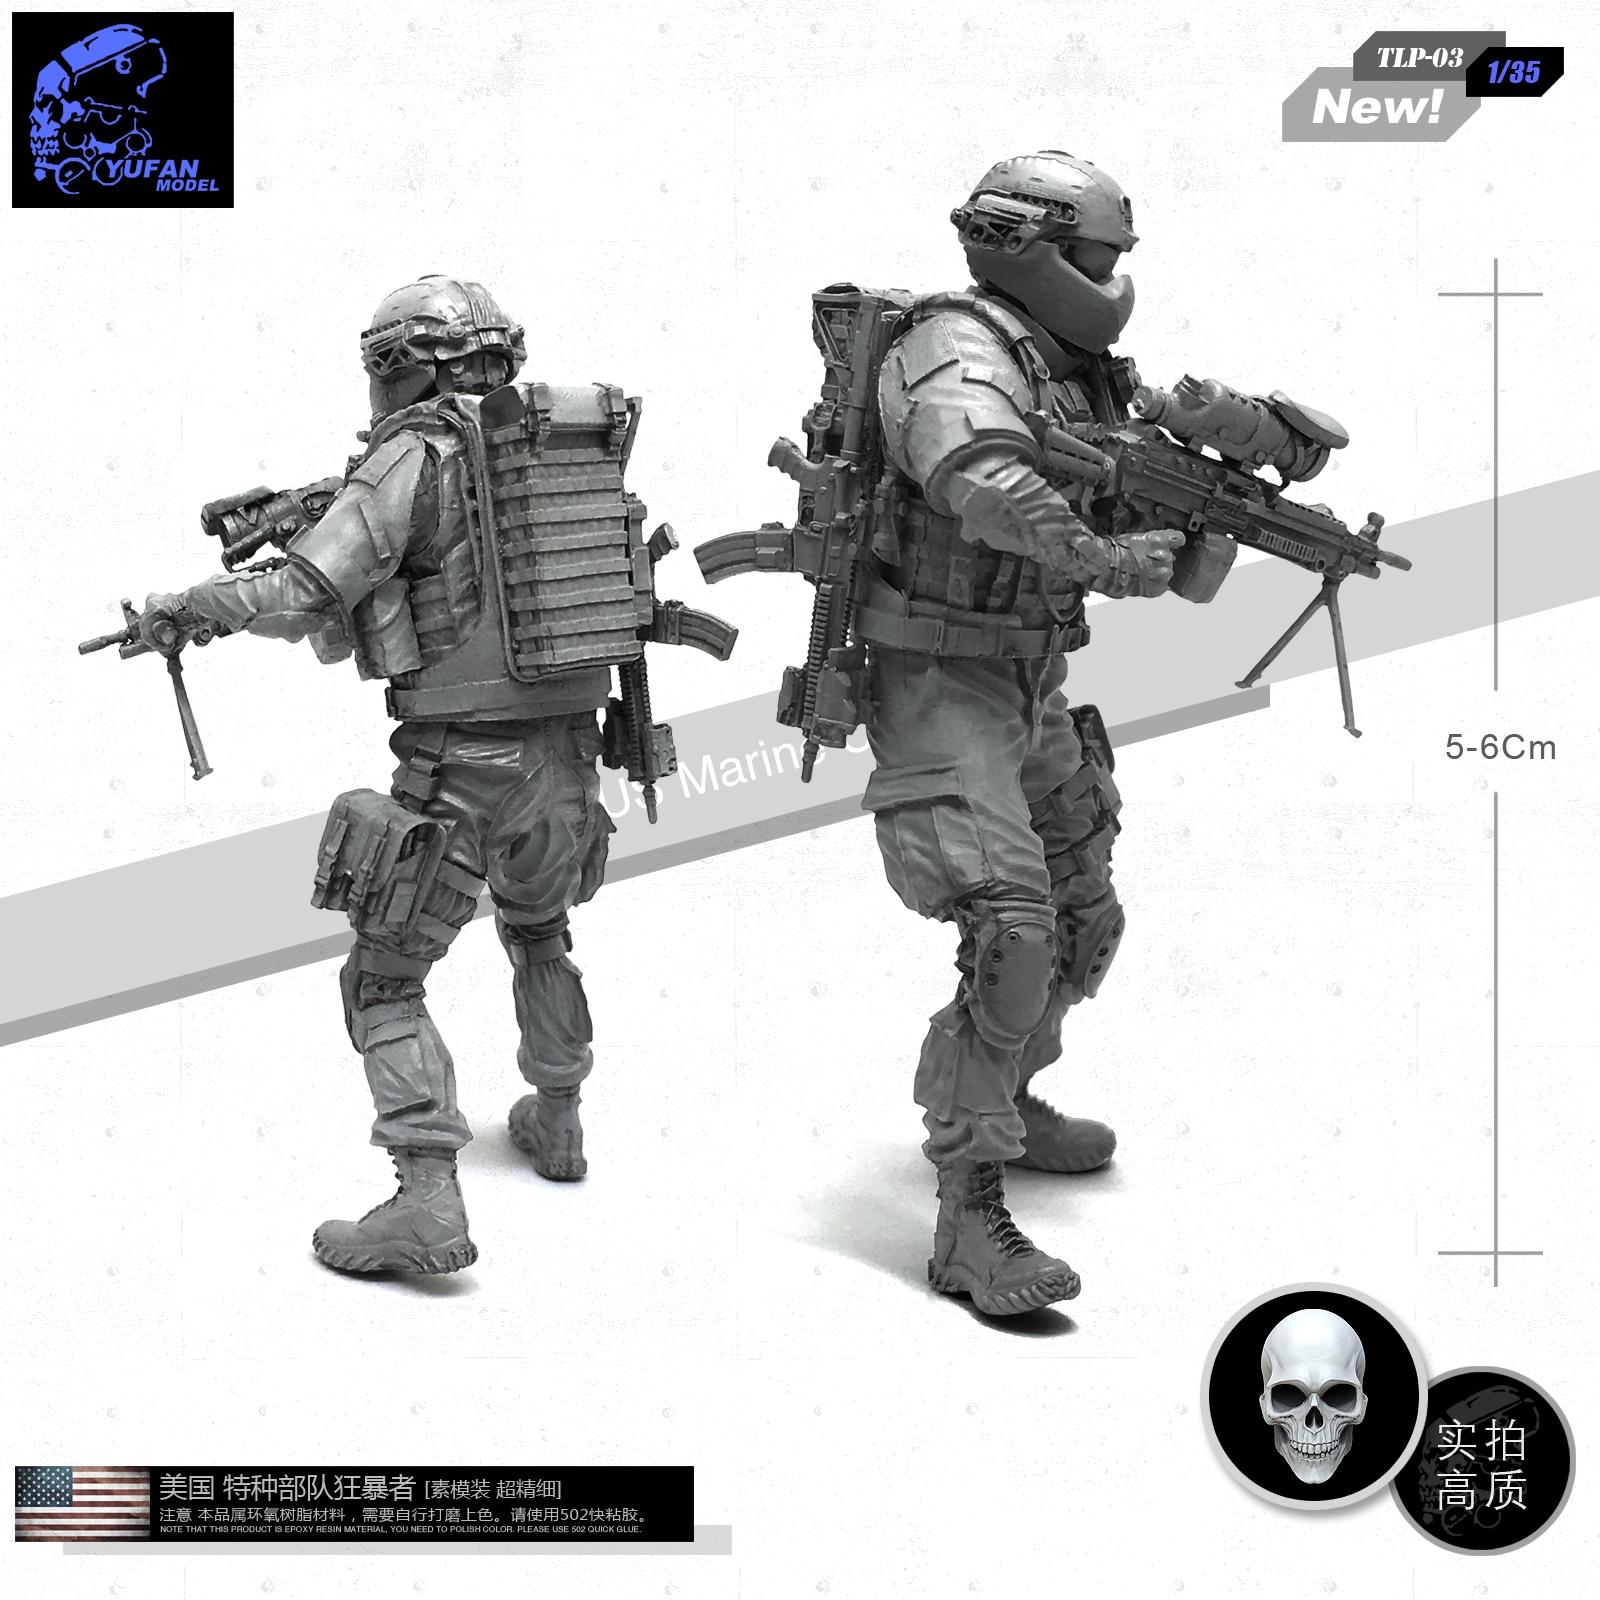 Yufan Model 1/35 Figure U.s. Special Forces Berserker C Resin Soldier Model Unmountel Kits Tlp-03(China)